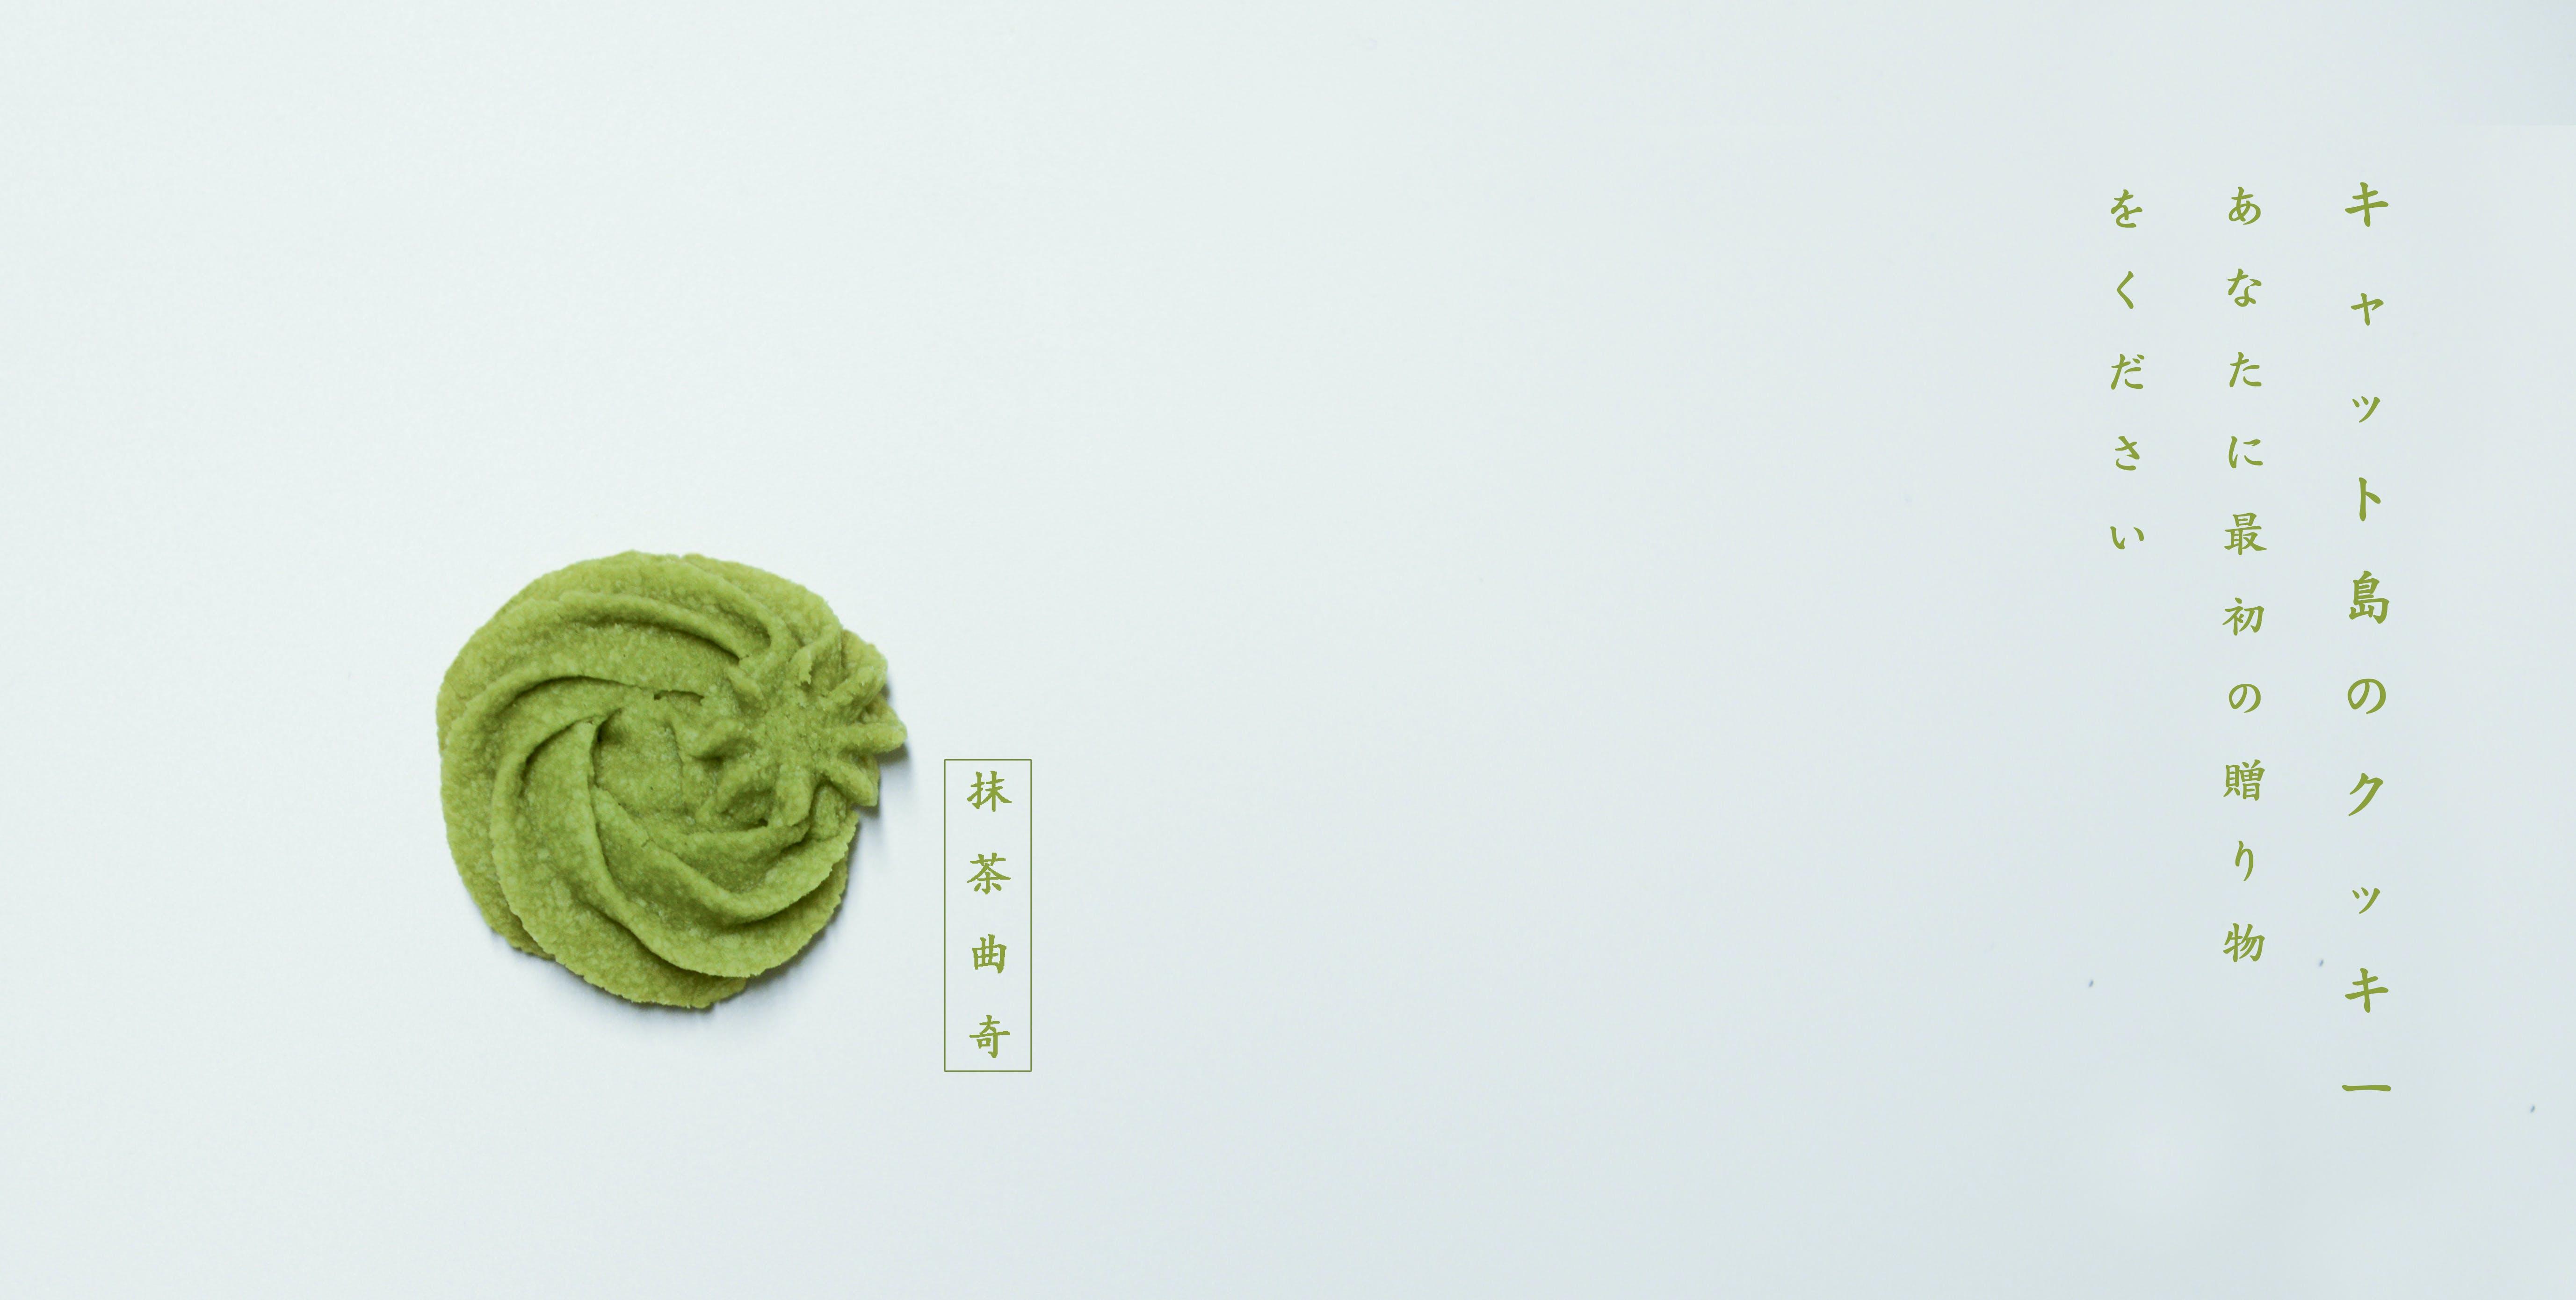 Free stock photo of cookies